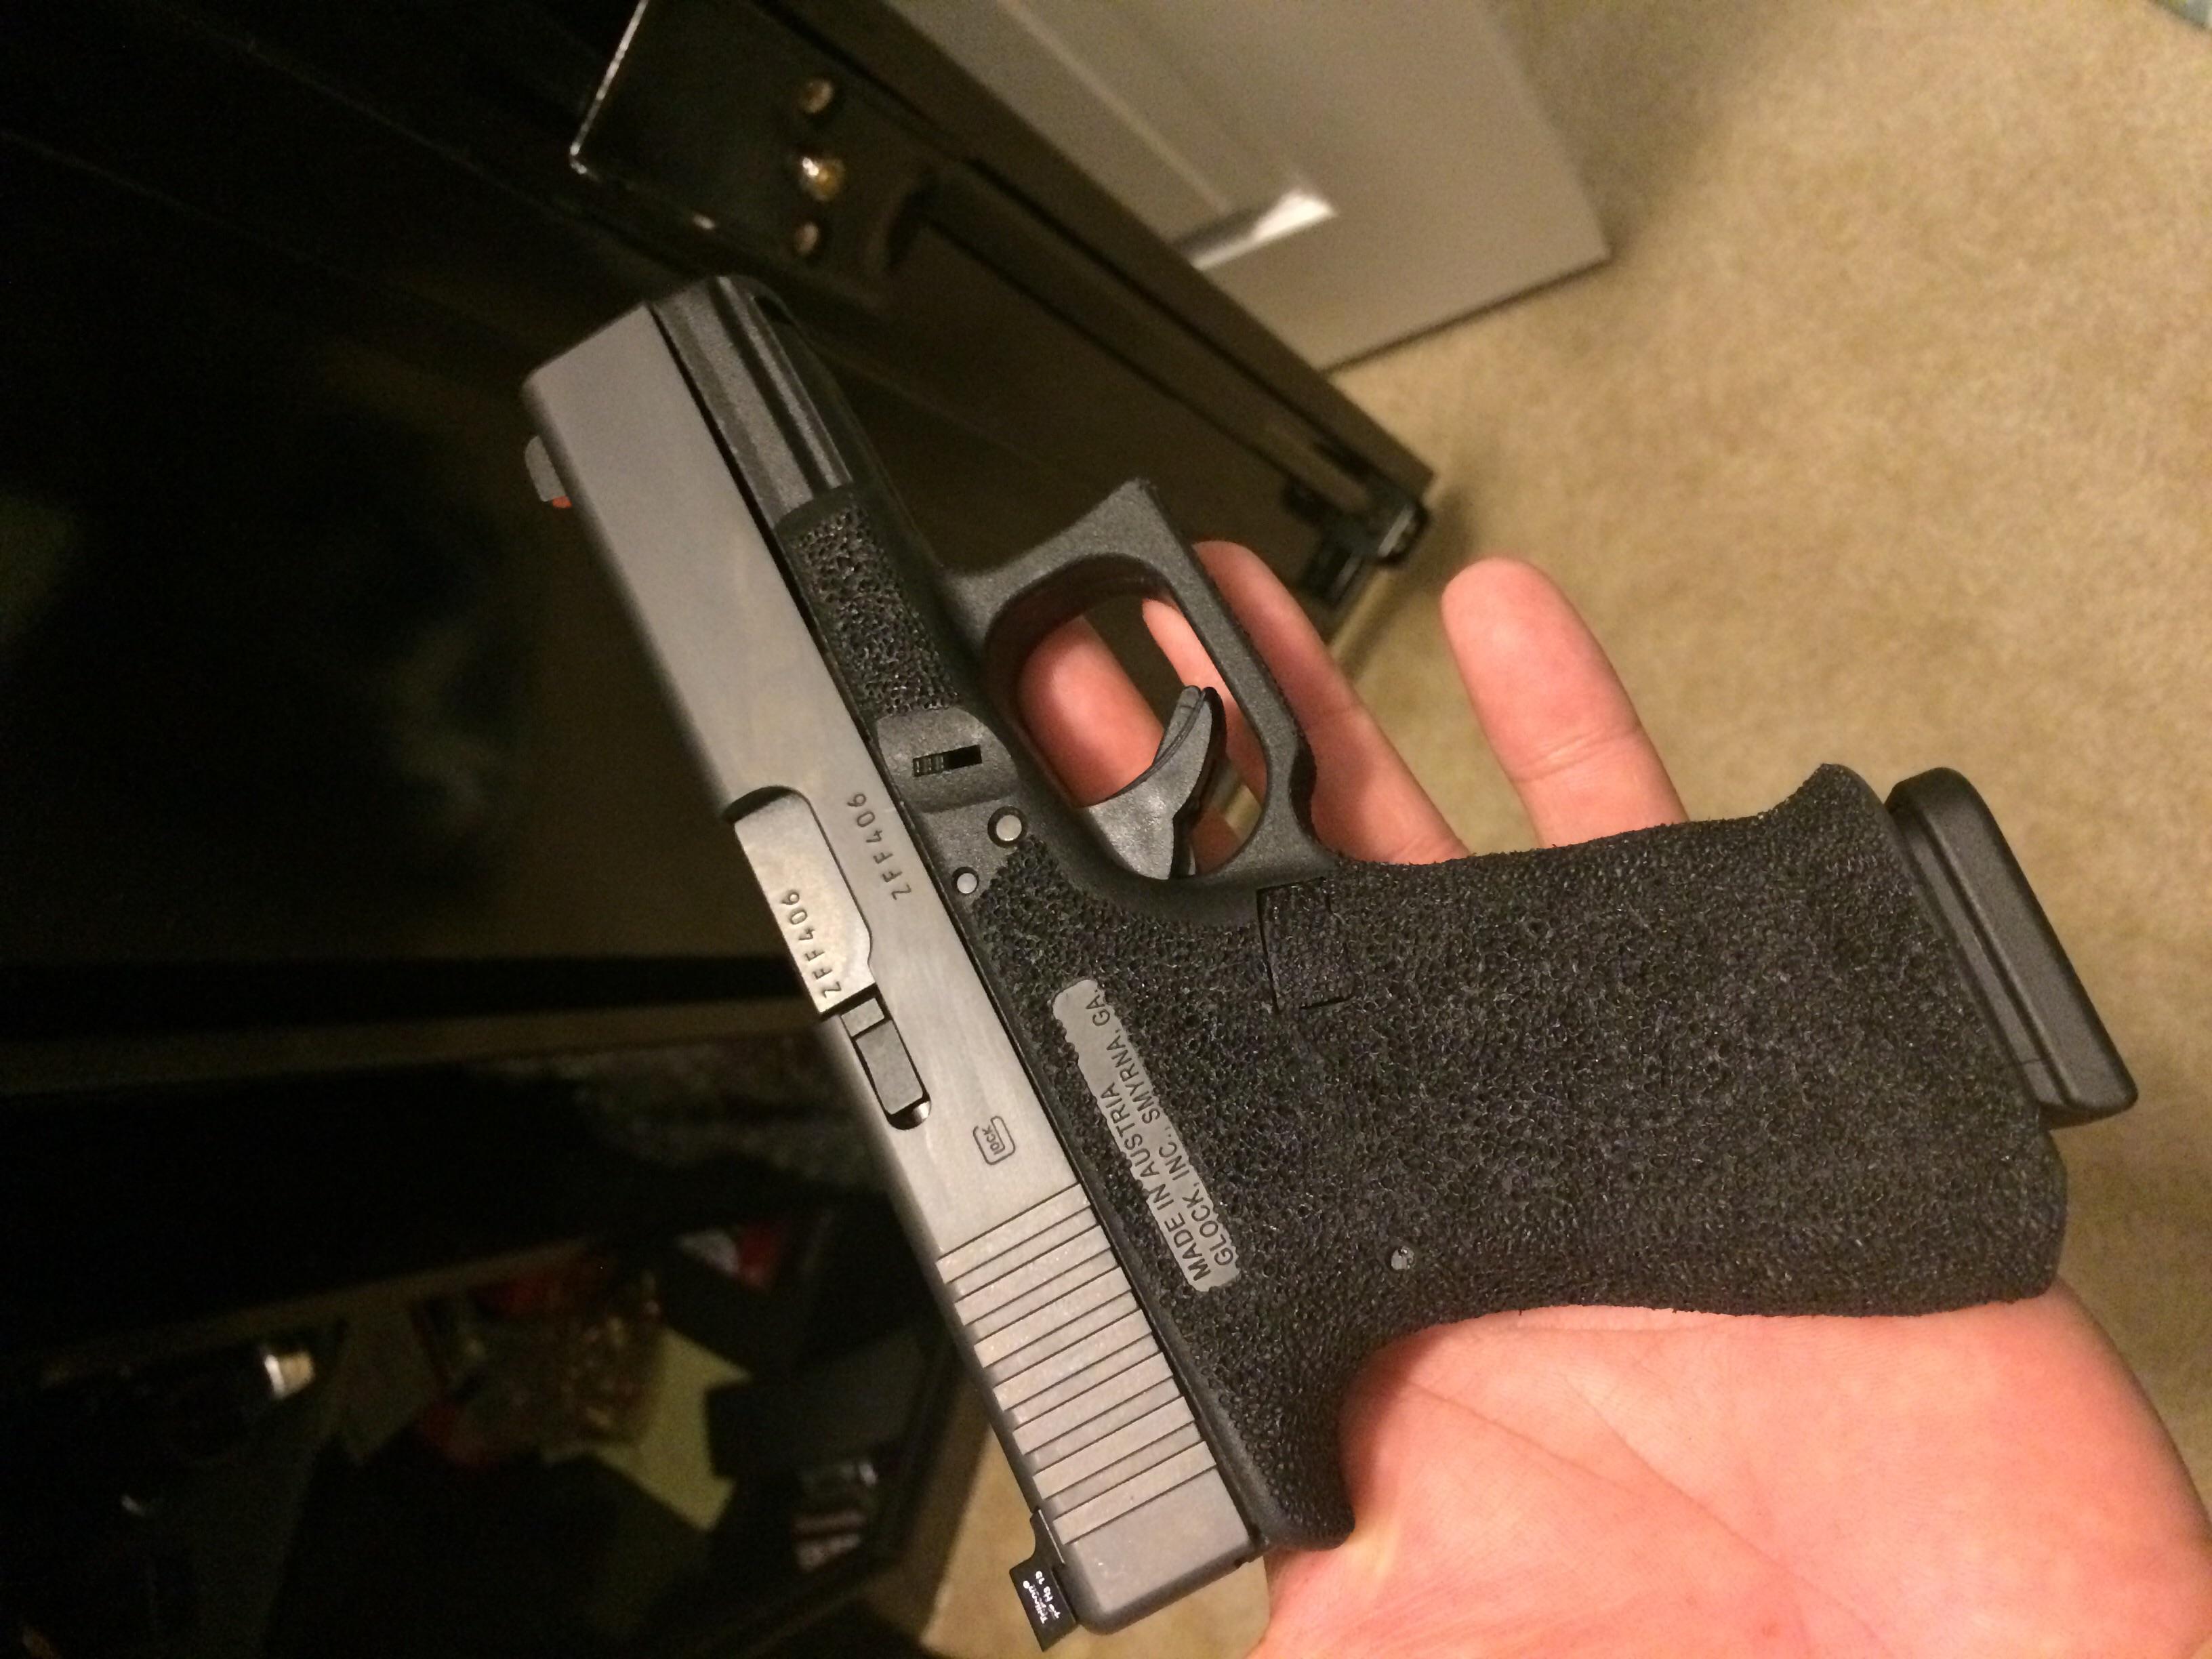 glock 19 extended magazine